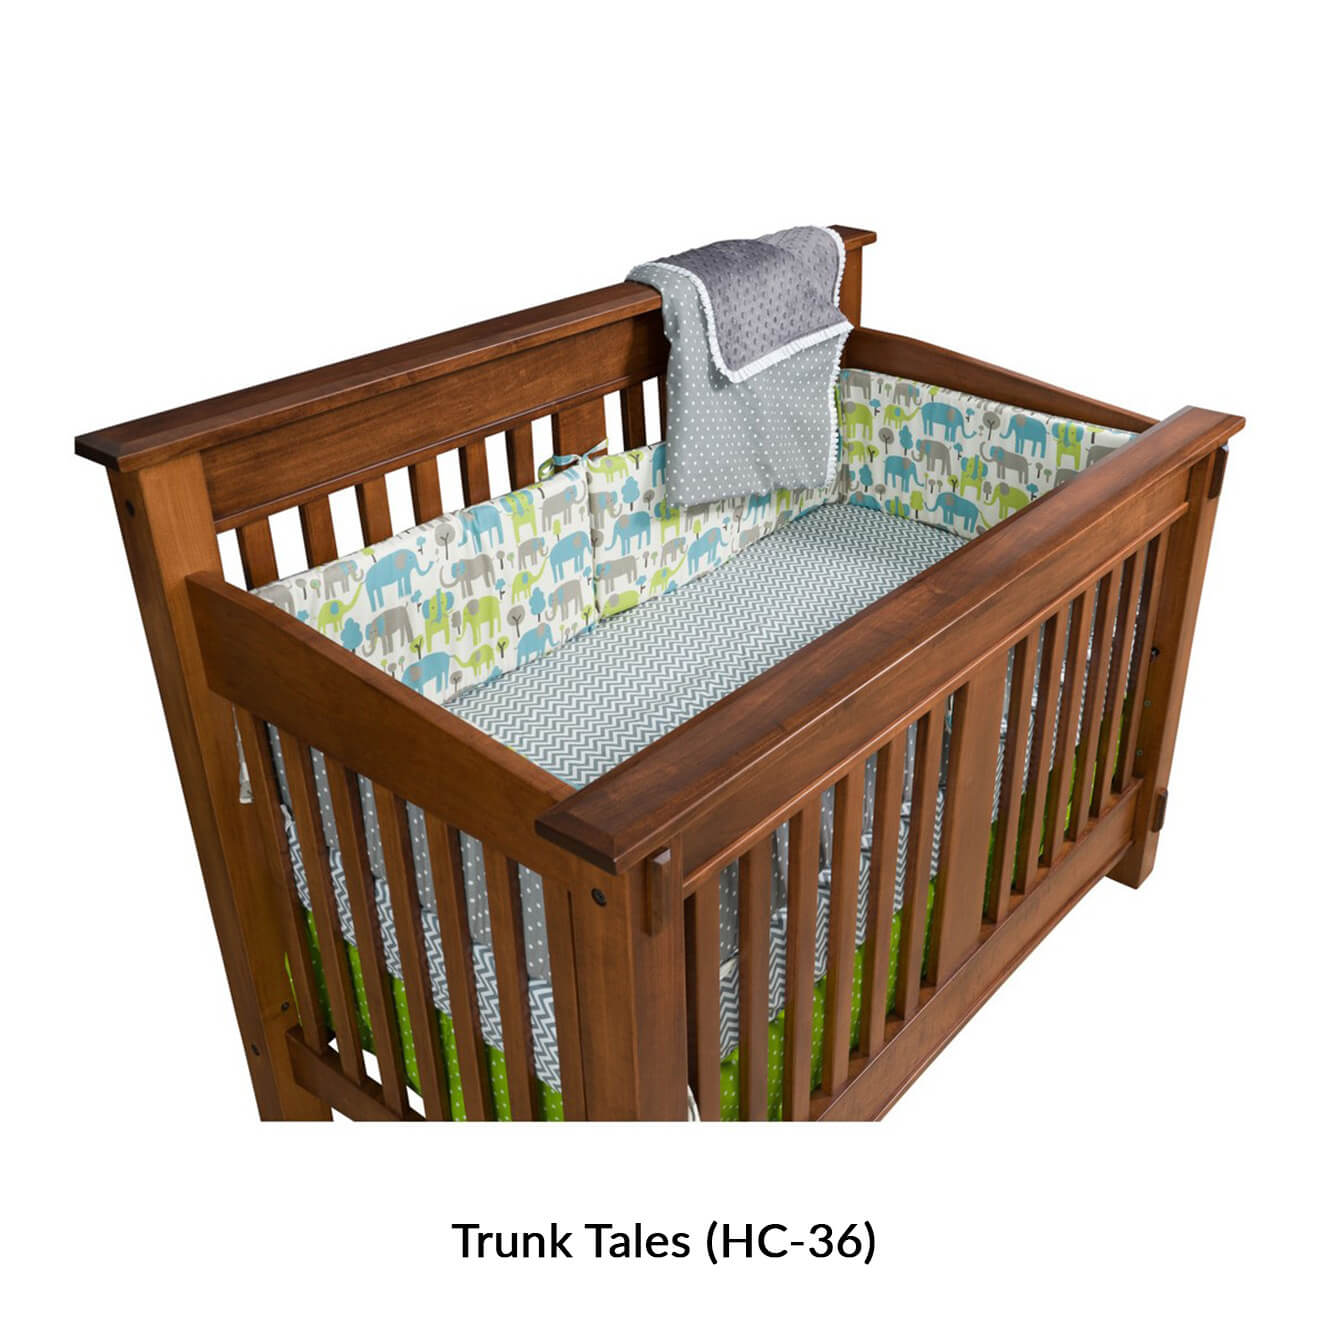 32.-trunk-tales-hc-36-.jpg